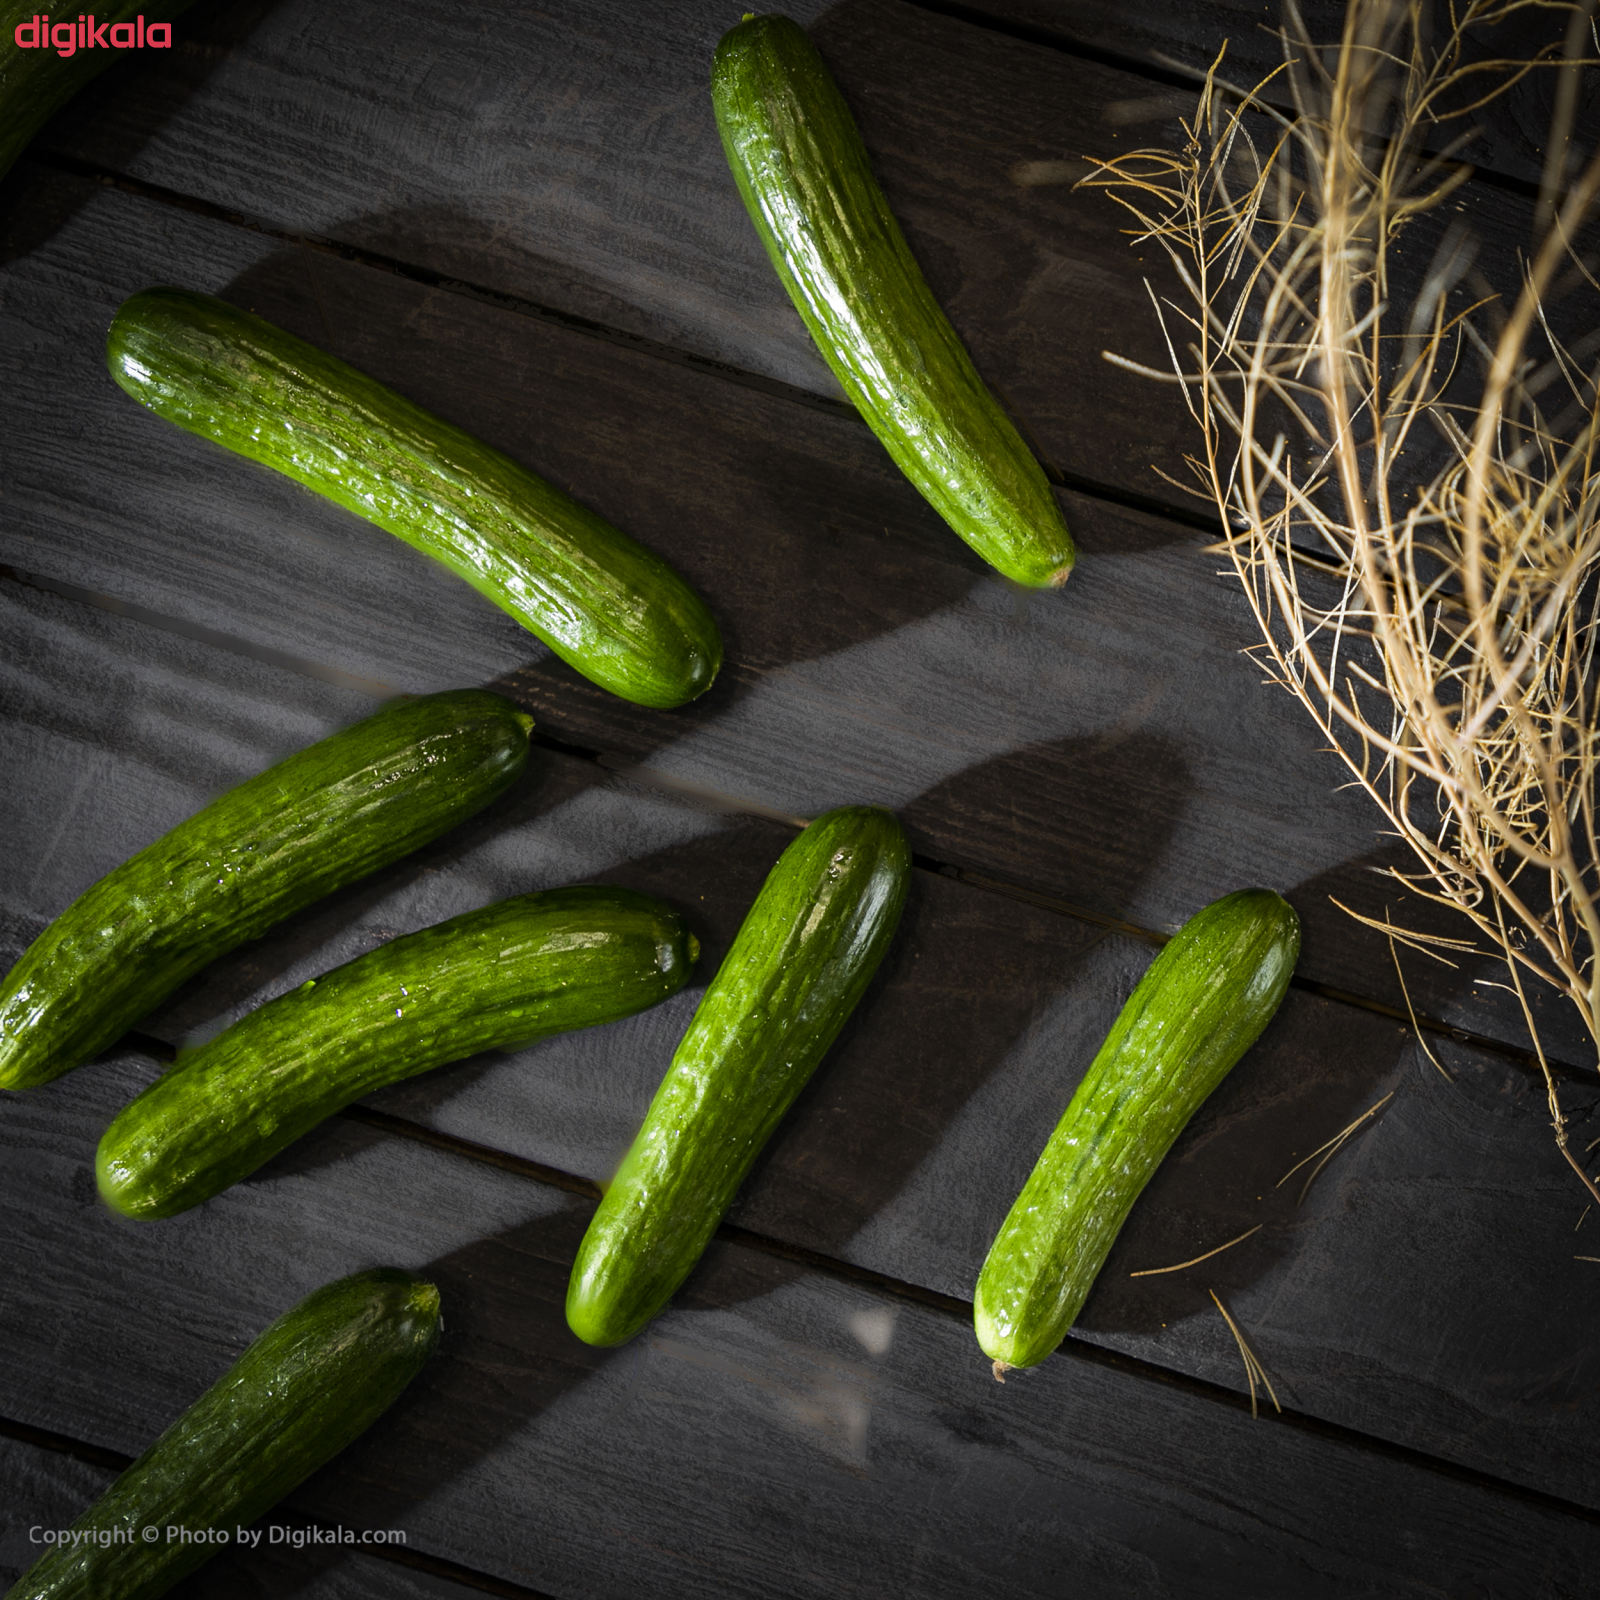 خیار گلخانه ای میوه پلاس - 1 کیلوگرم main 1 3